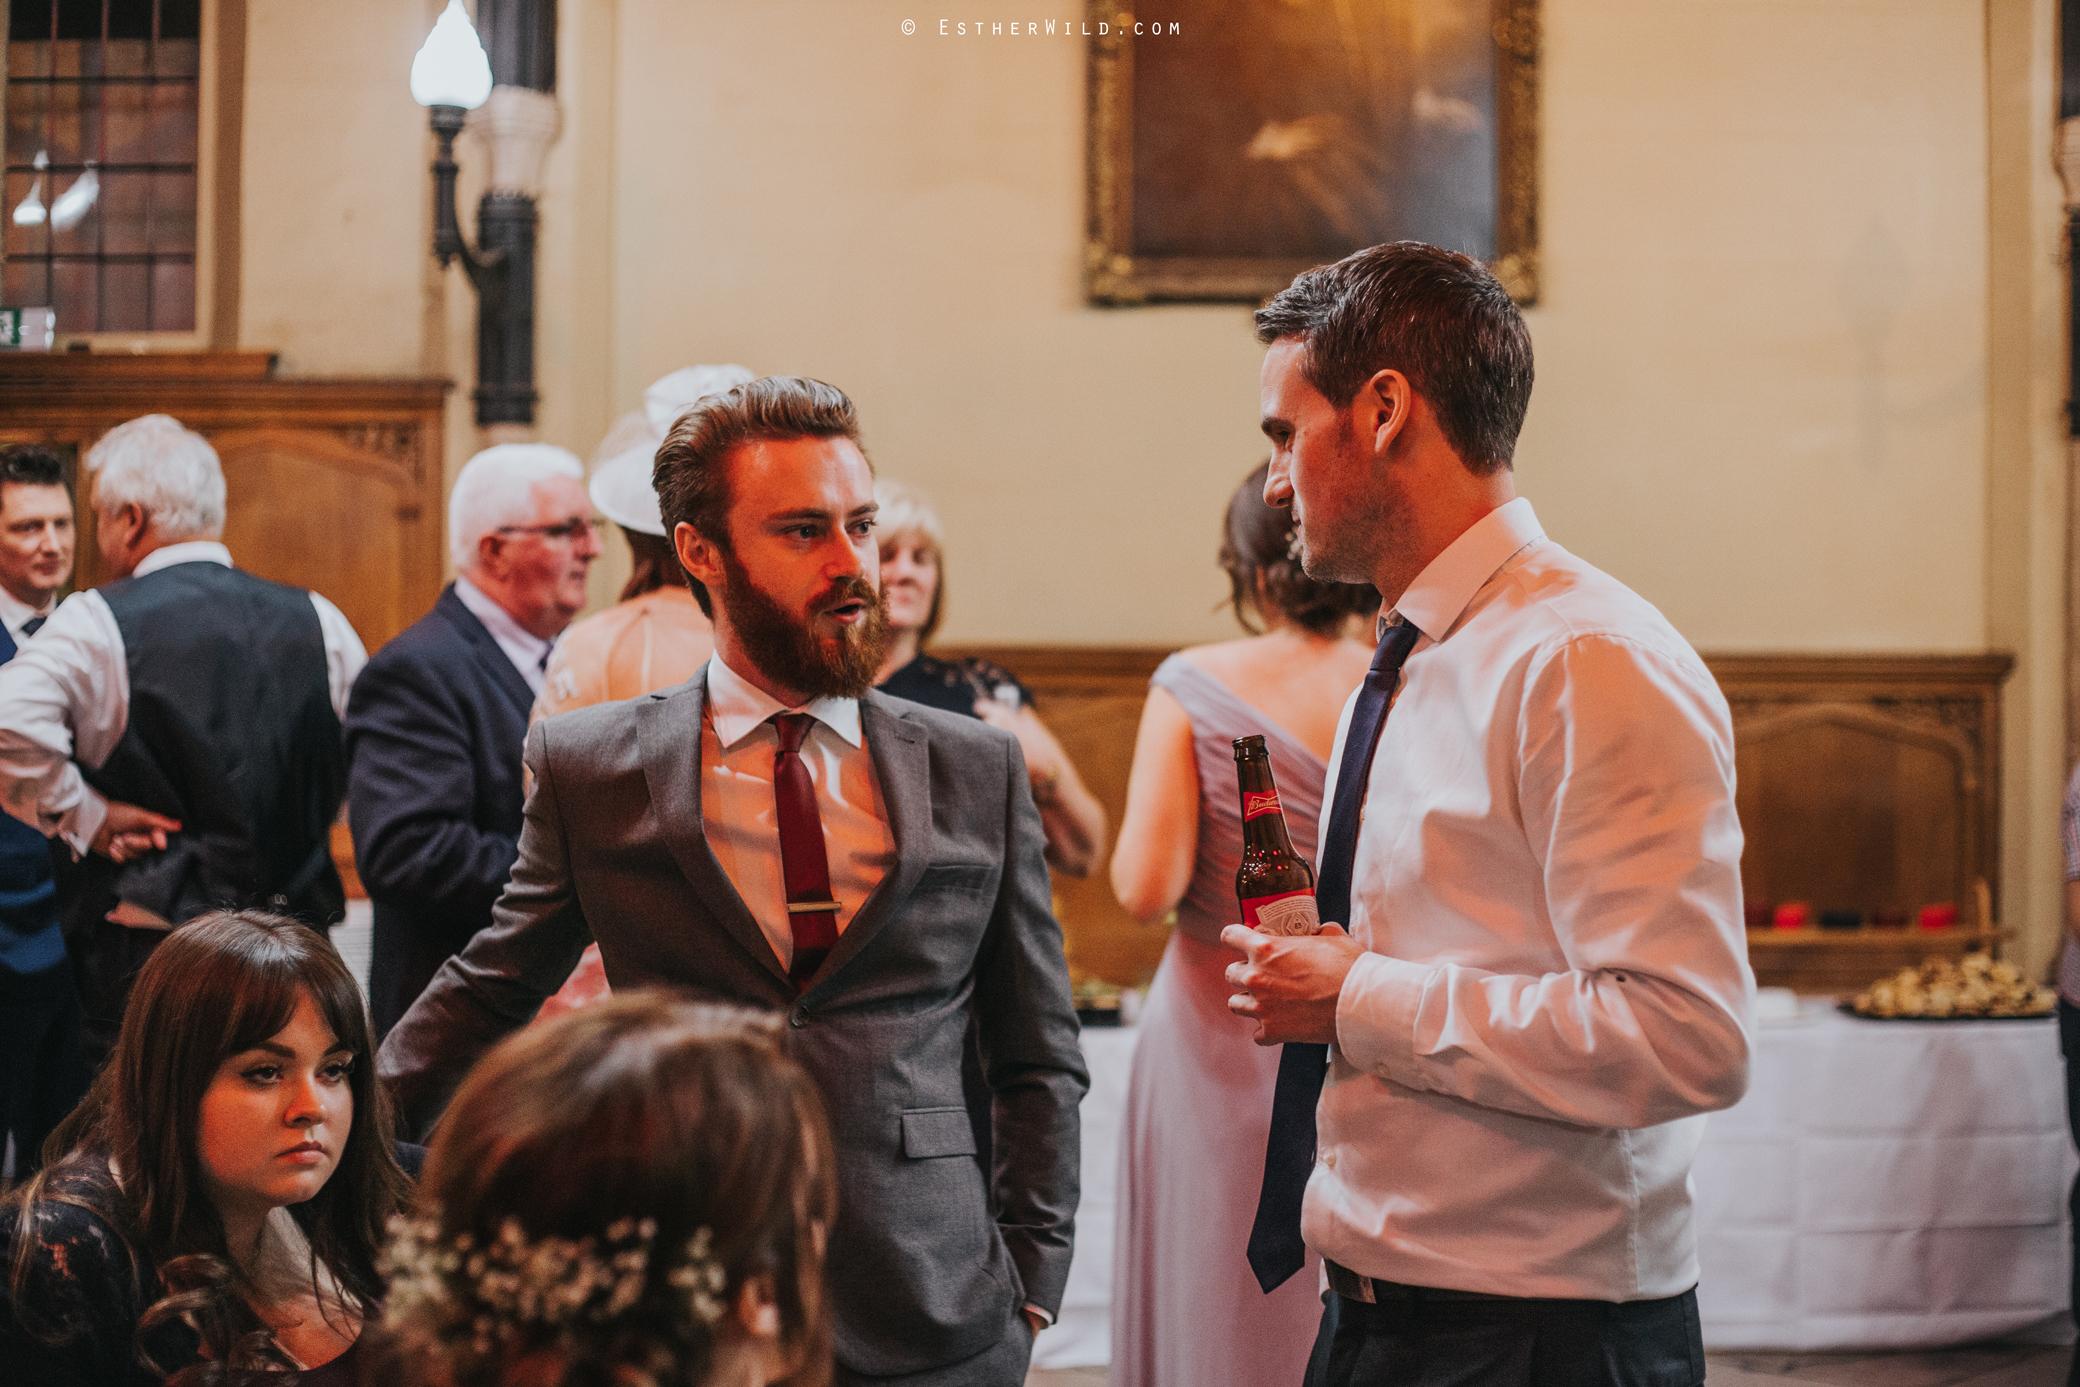 Wedding_Kings_Lynn_Town_Hall_Norfolk_Photographer_Esther_Wild_IMG_1746.jpg